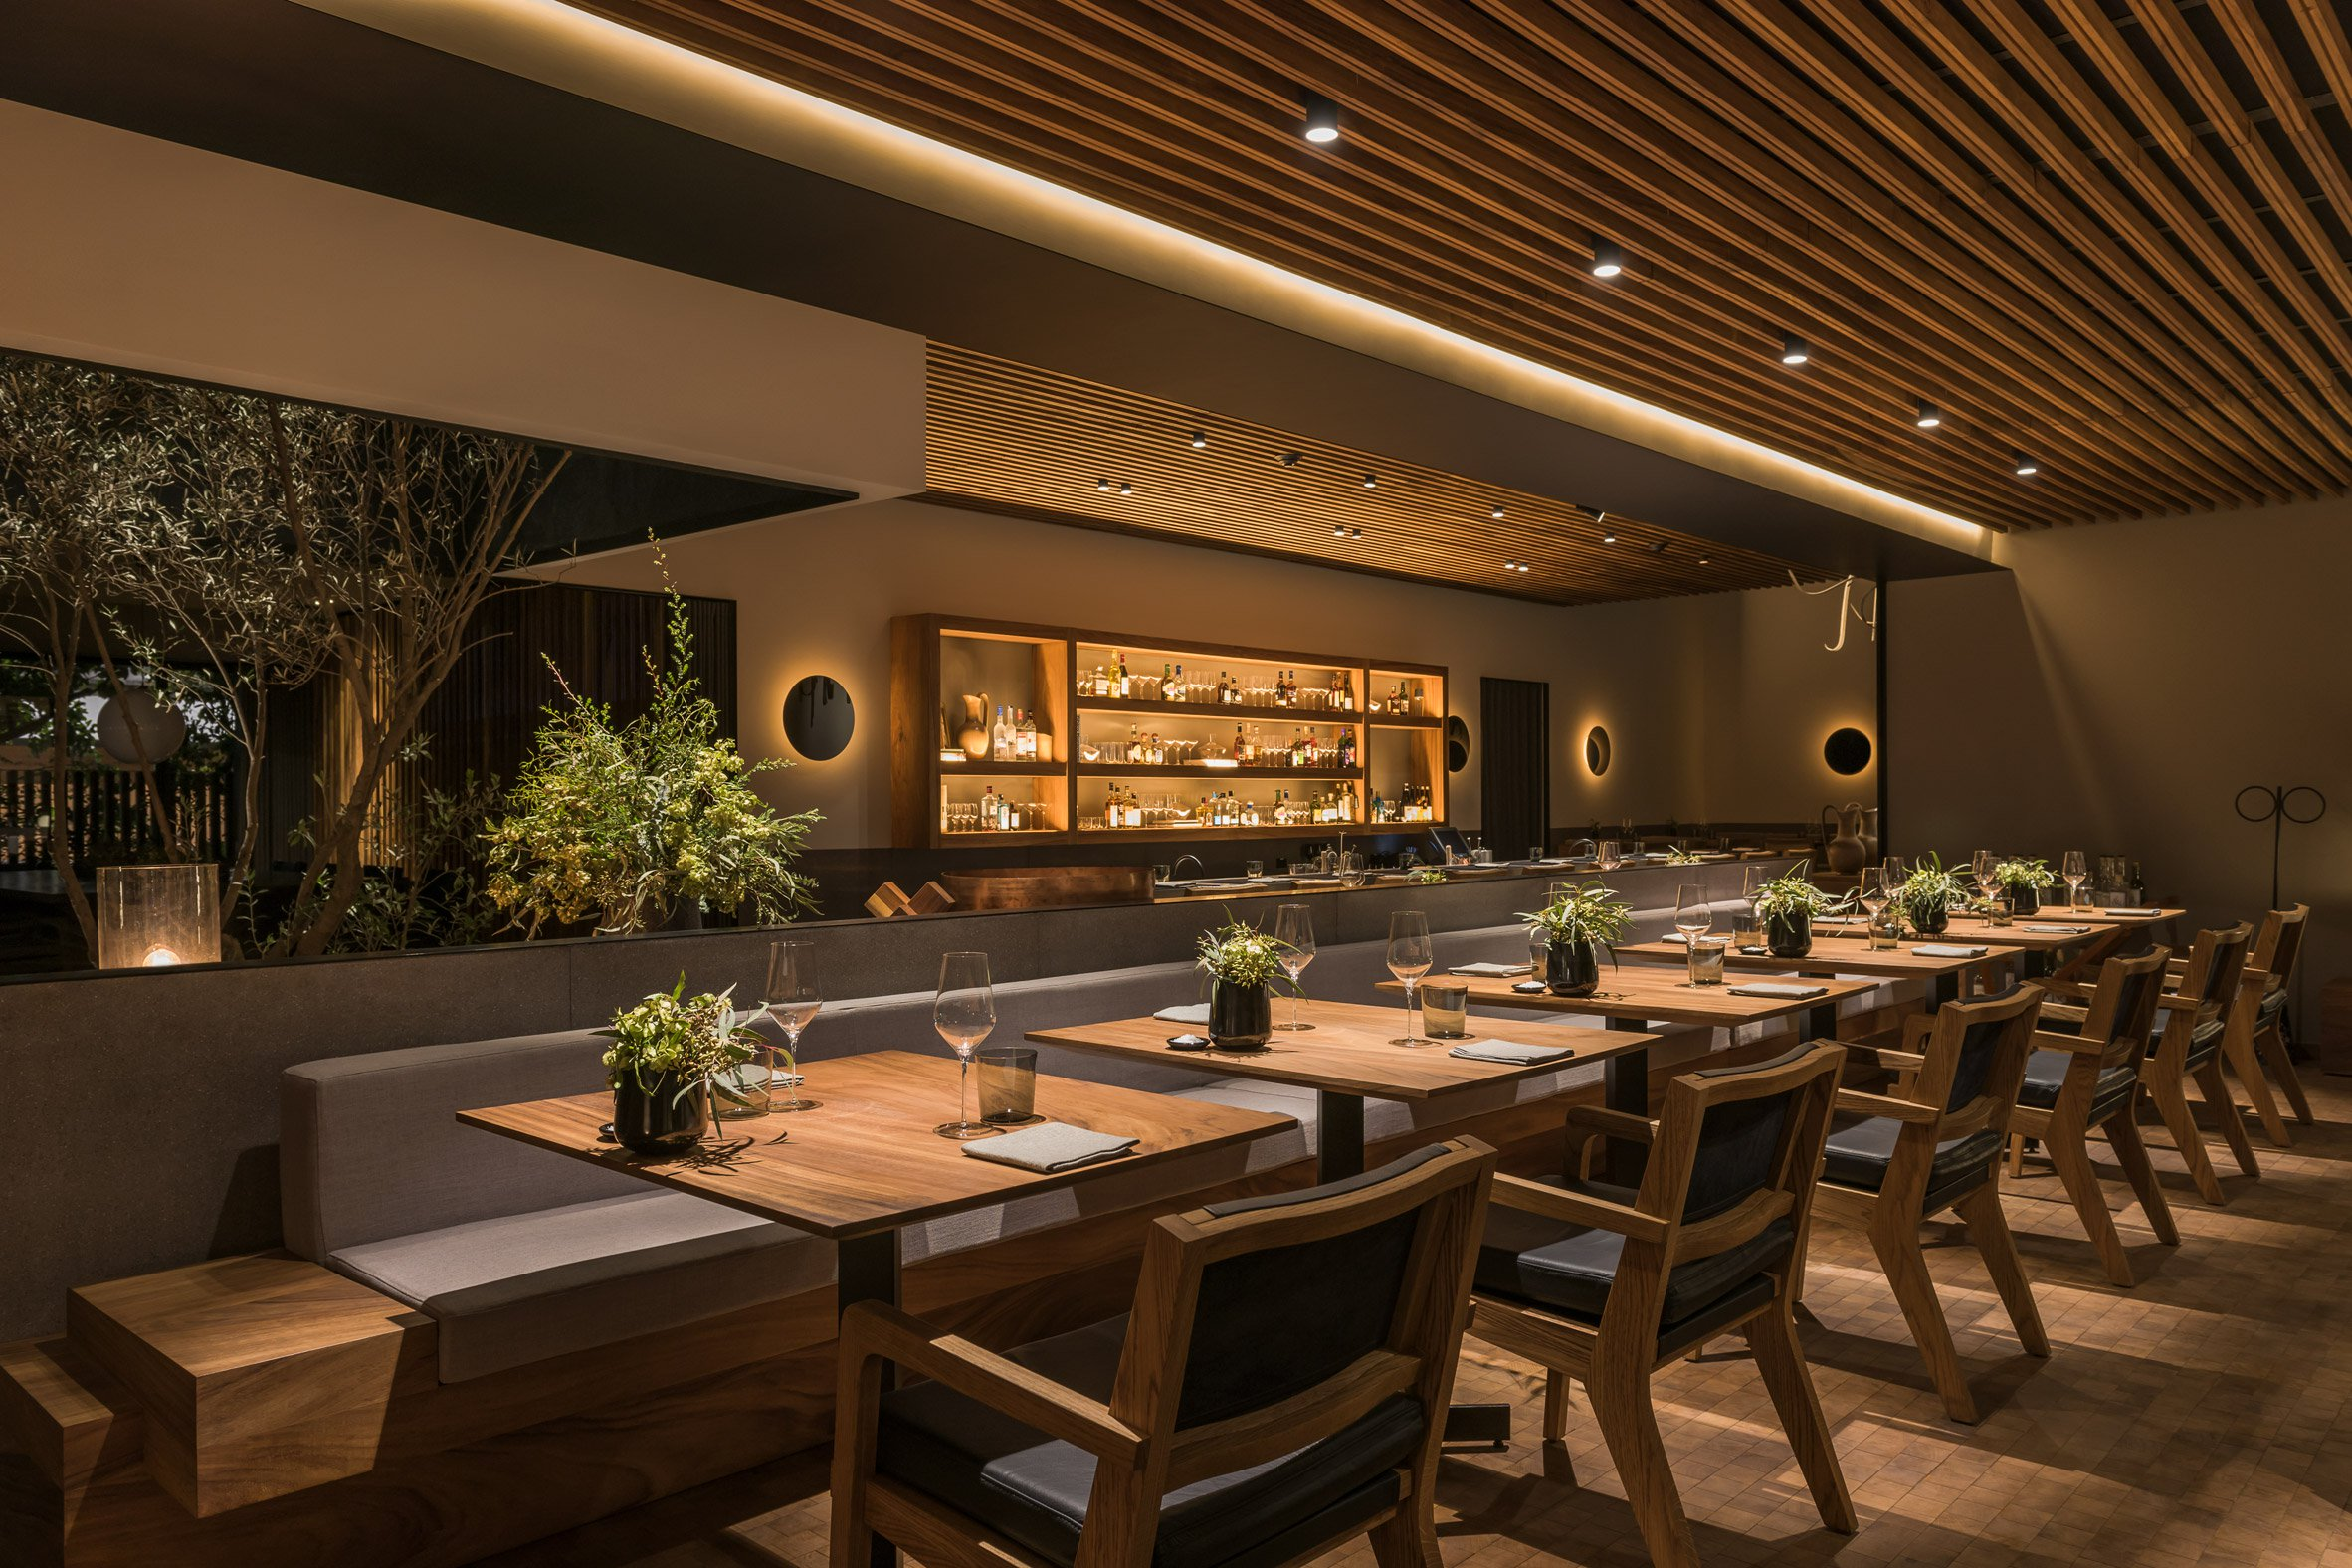 architecture-pujol-restaurant-interiors-design-studia-osnovadesign-osnova-poltava_05